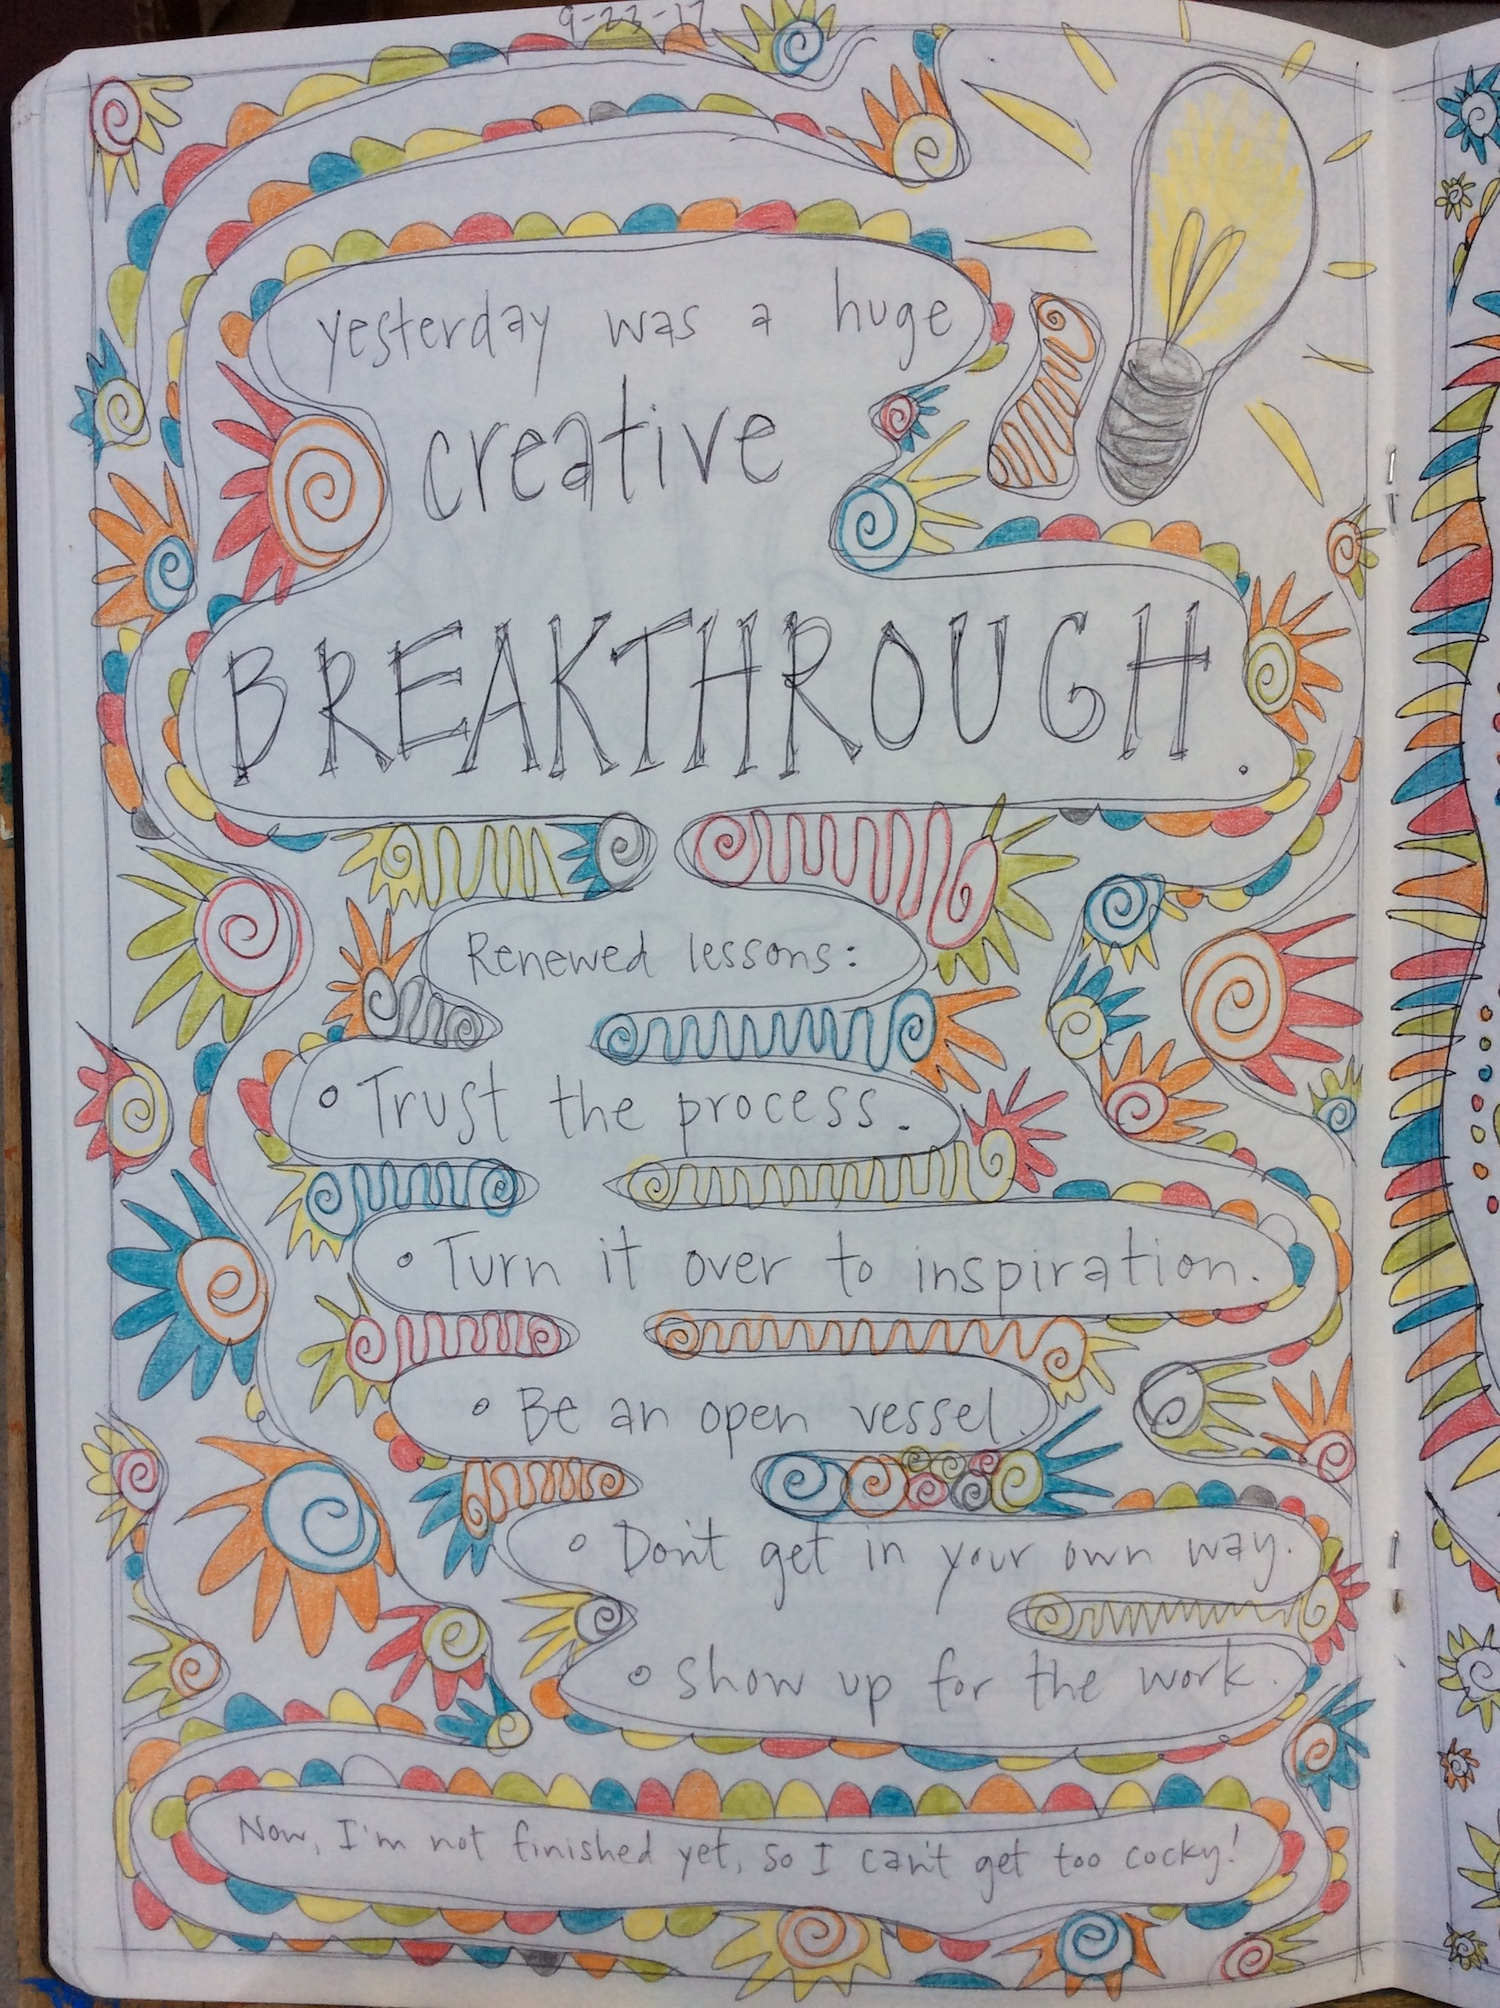 breakthrough doodle.JPG